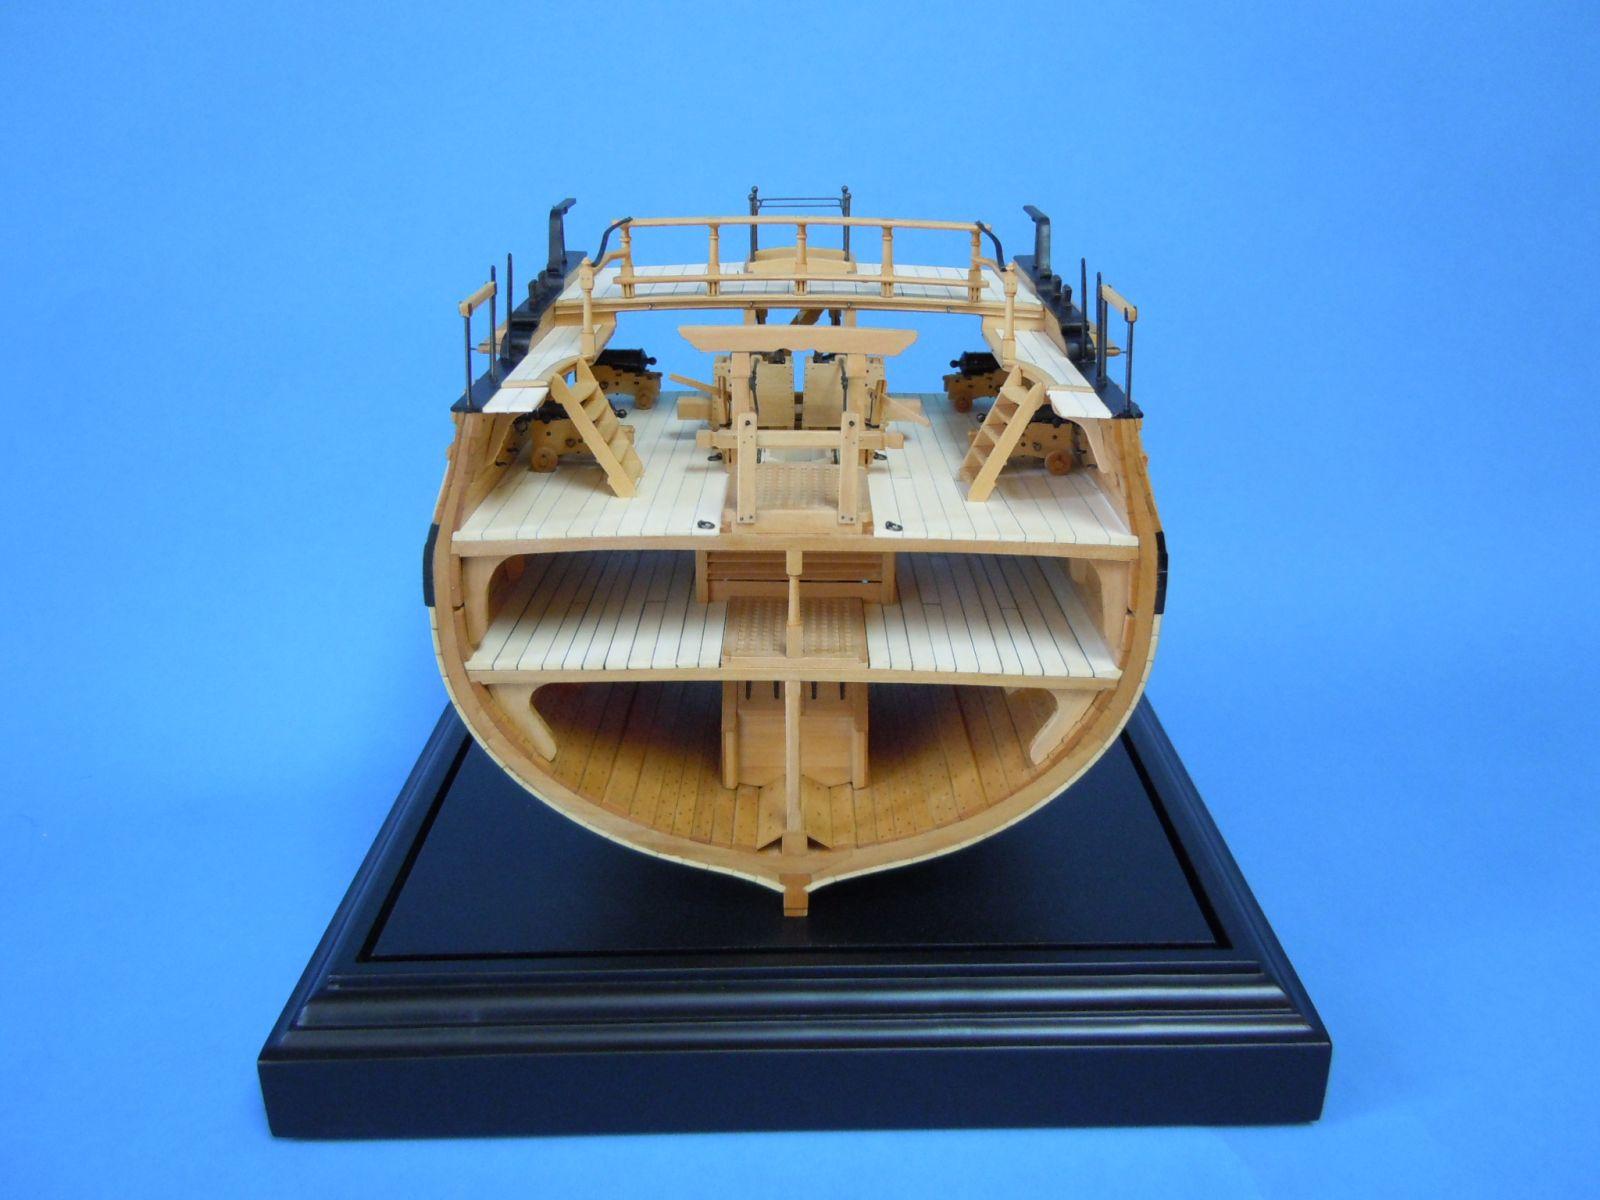 HMN Swan Class Sloop Pegasus Cross-section by Greg Herbert